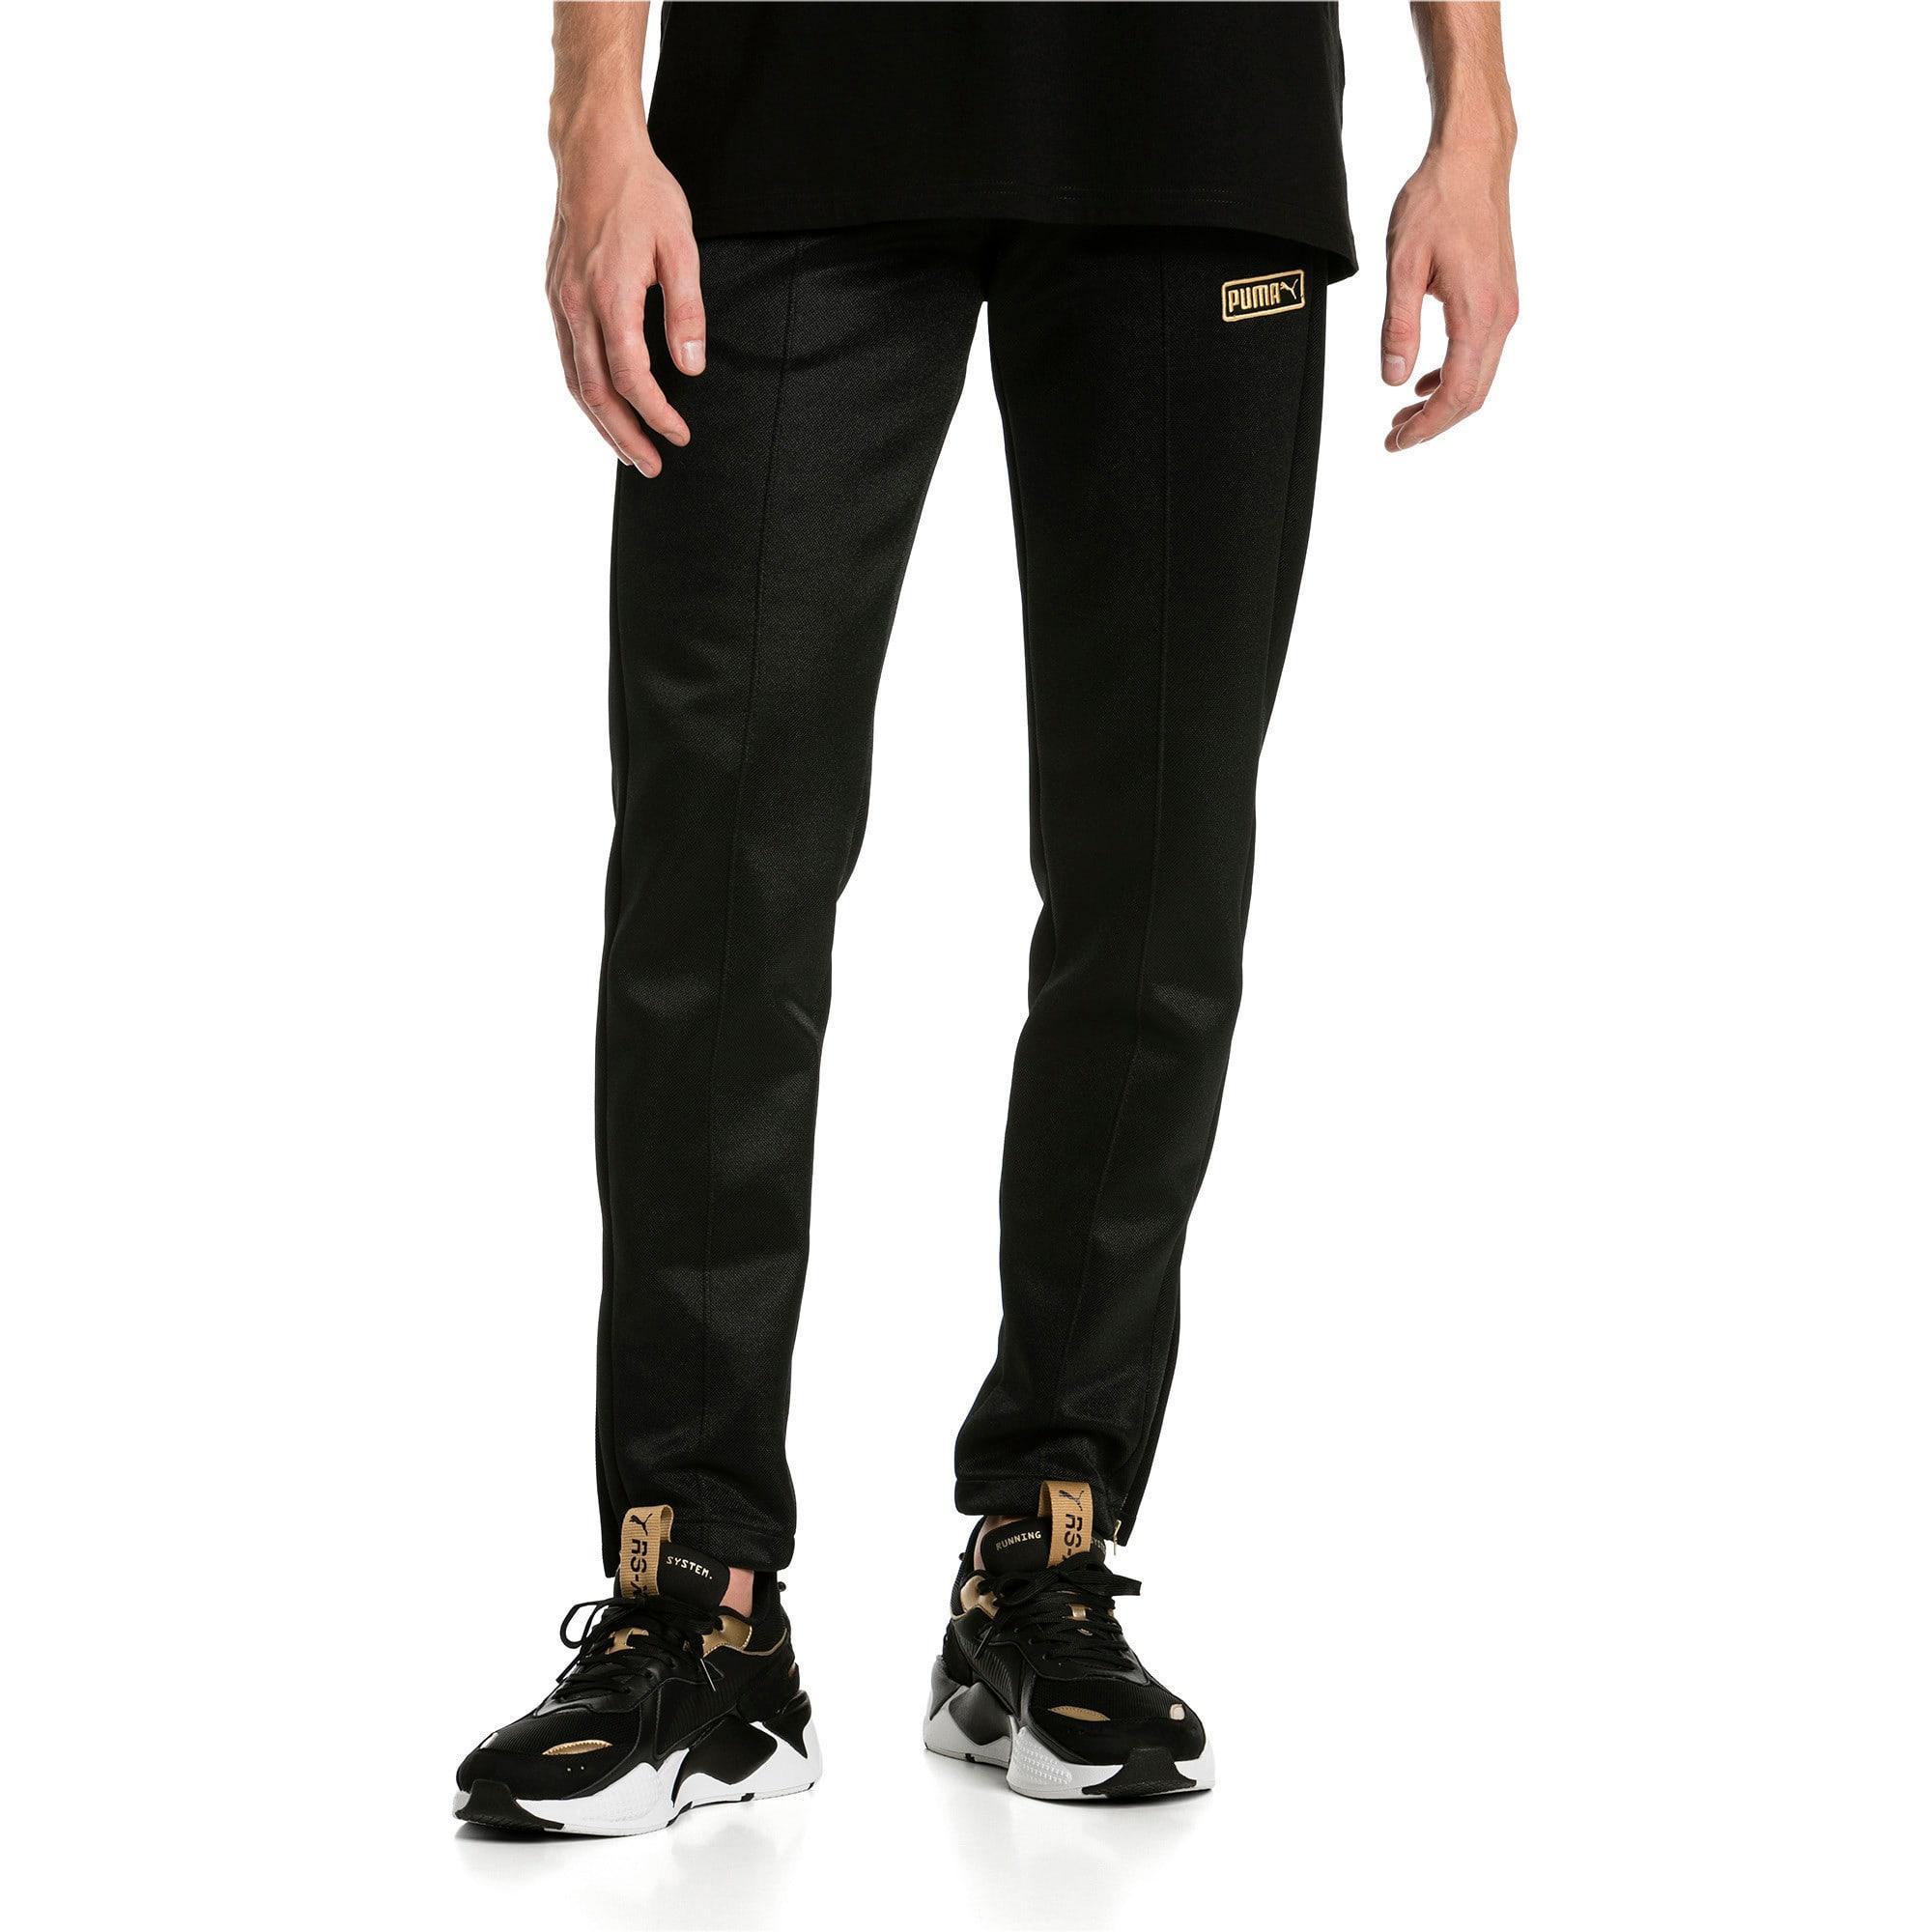 Thumbnail 1 of T7 Spezial Trophy Track Pants, Puma Black, medium-IND